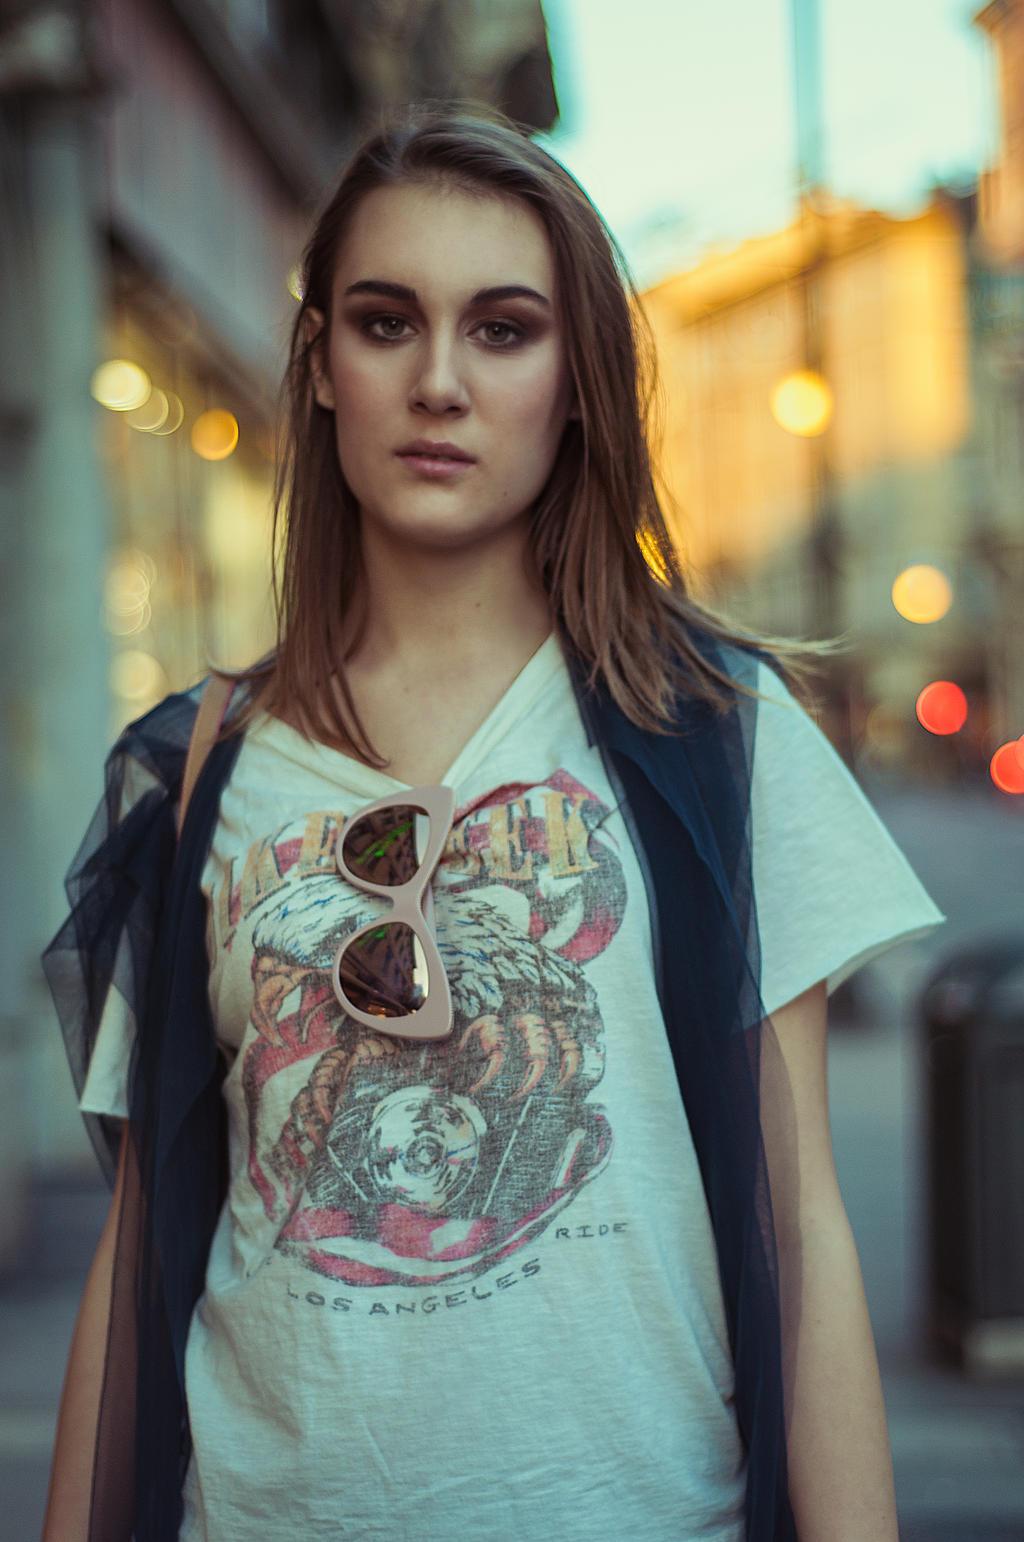 Urban Stranger - Blue hour 4 by Michela-Riva